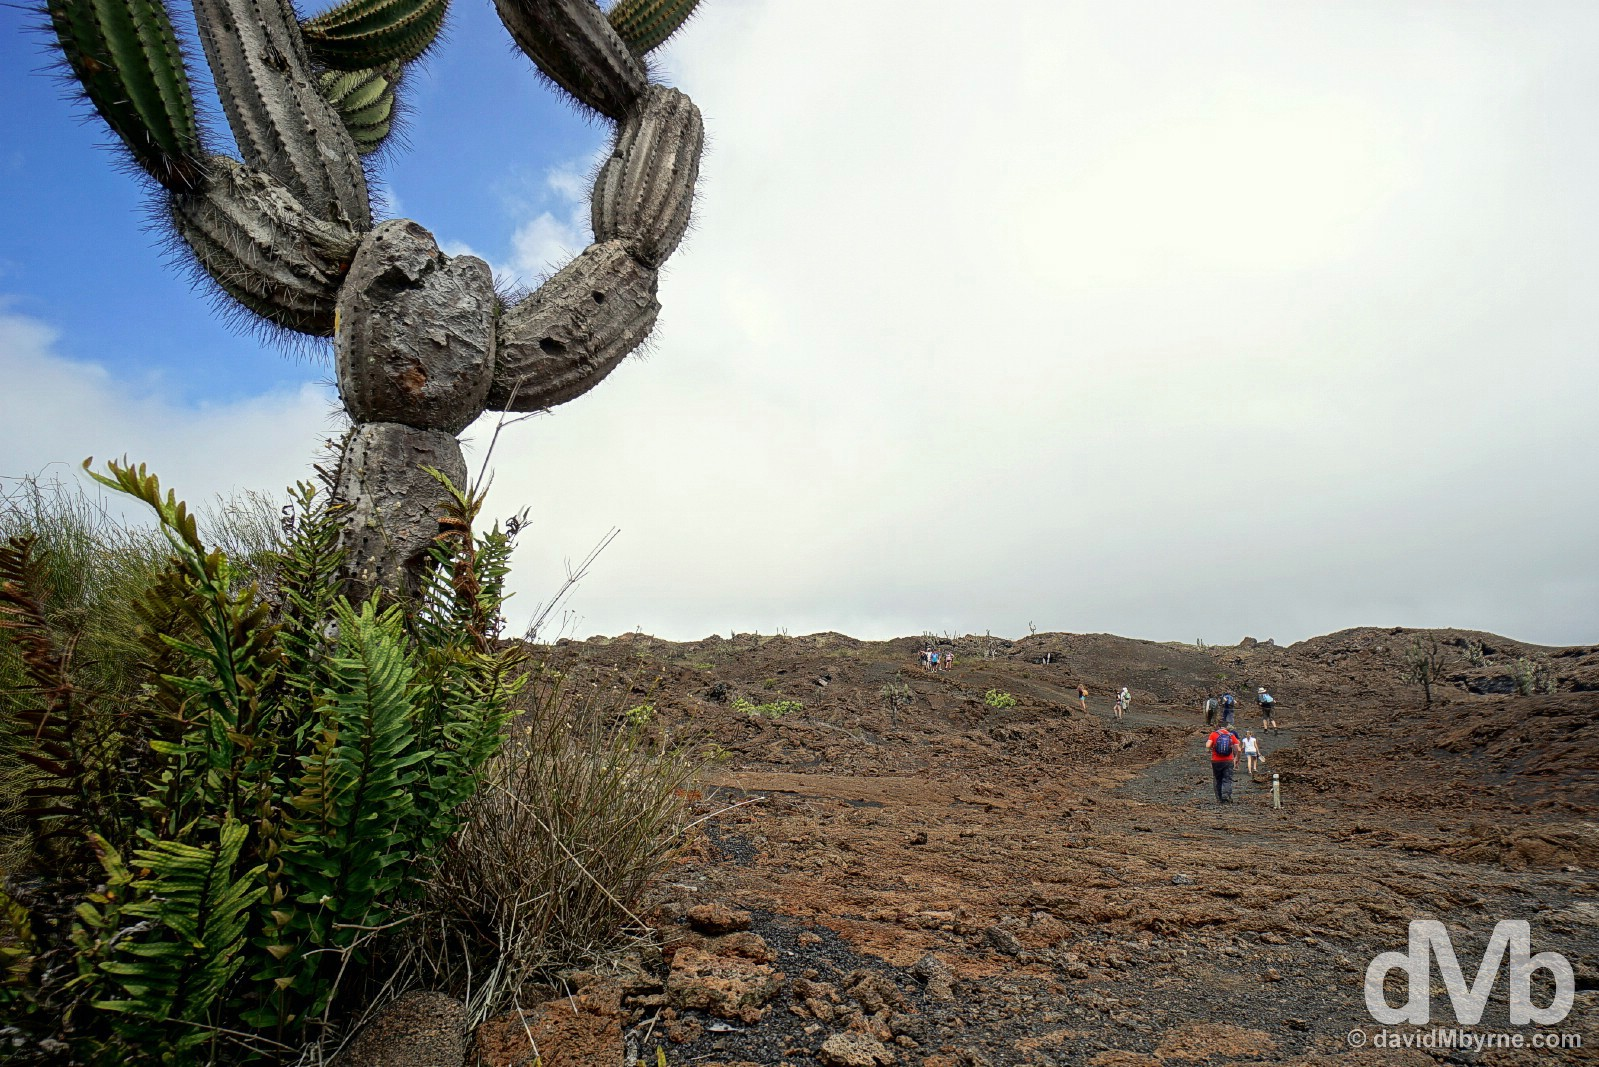 Volcanic topography on Volcan Chico, Isla Isabela, Galapagos Islands, Ecuador. July 20, 2015.